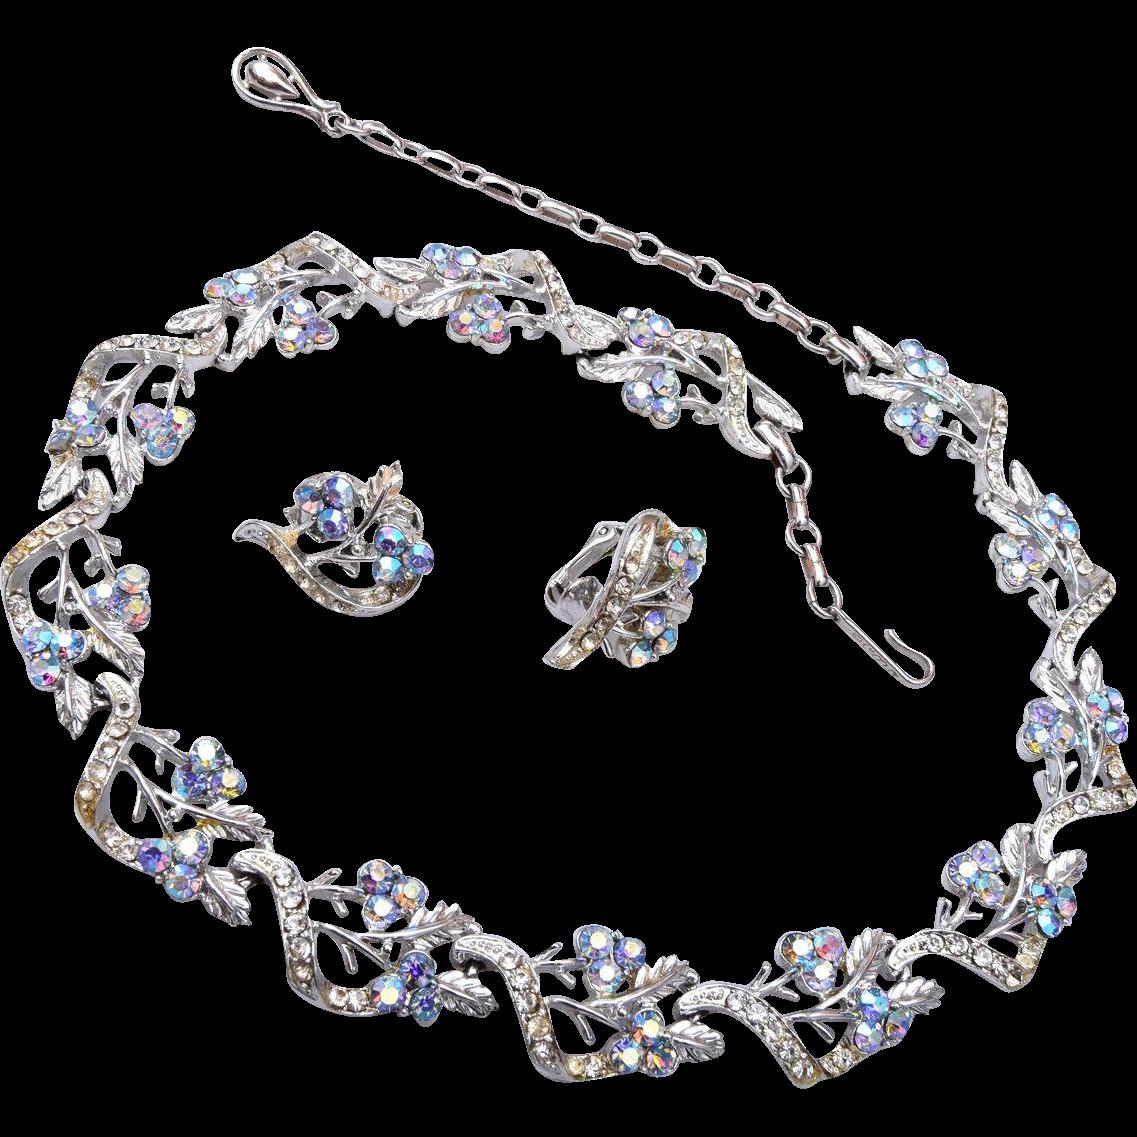 Coro Aurora Borealis Rhinestone Necklace and Earring Set